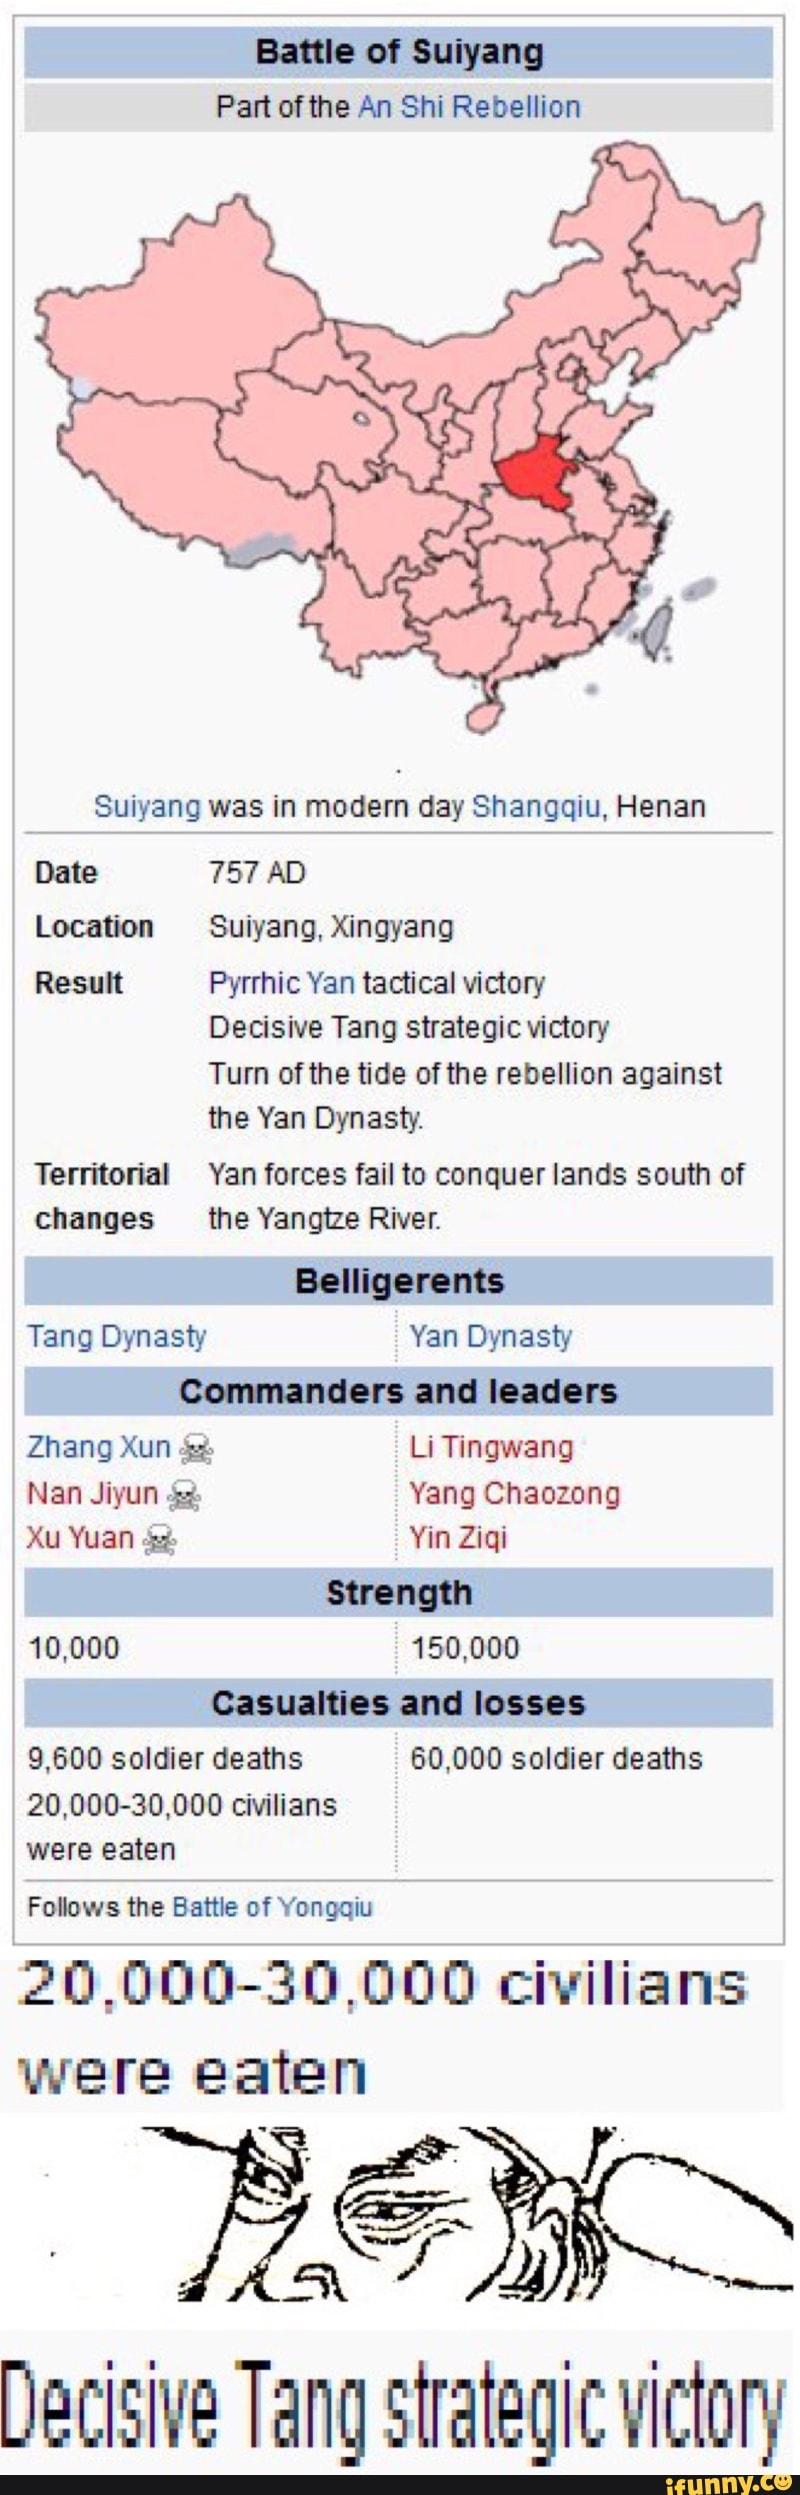 Battle of Suiyang